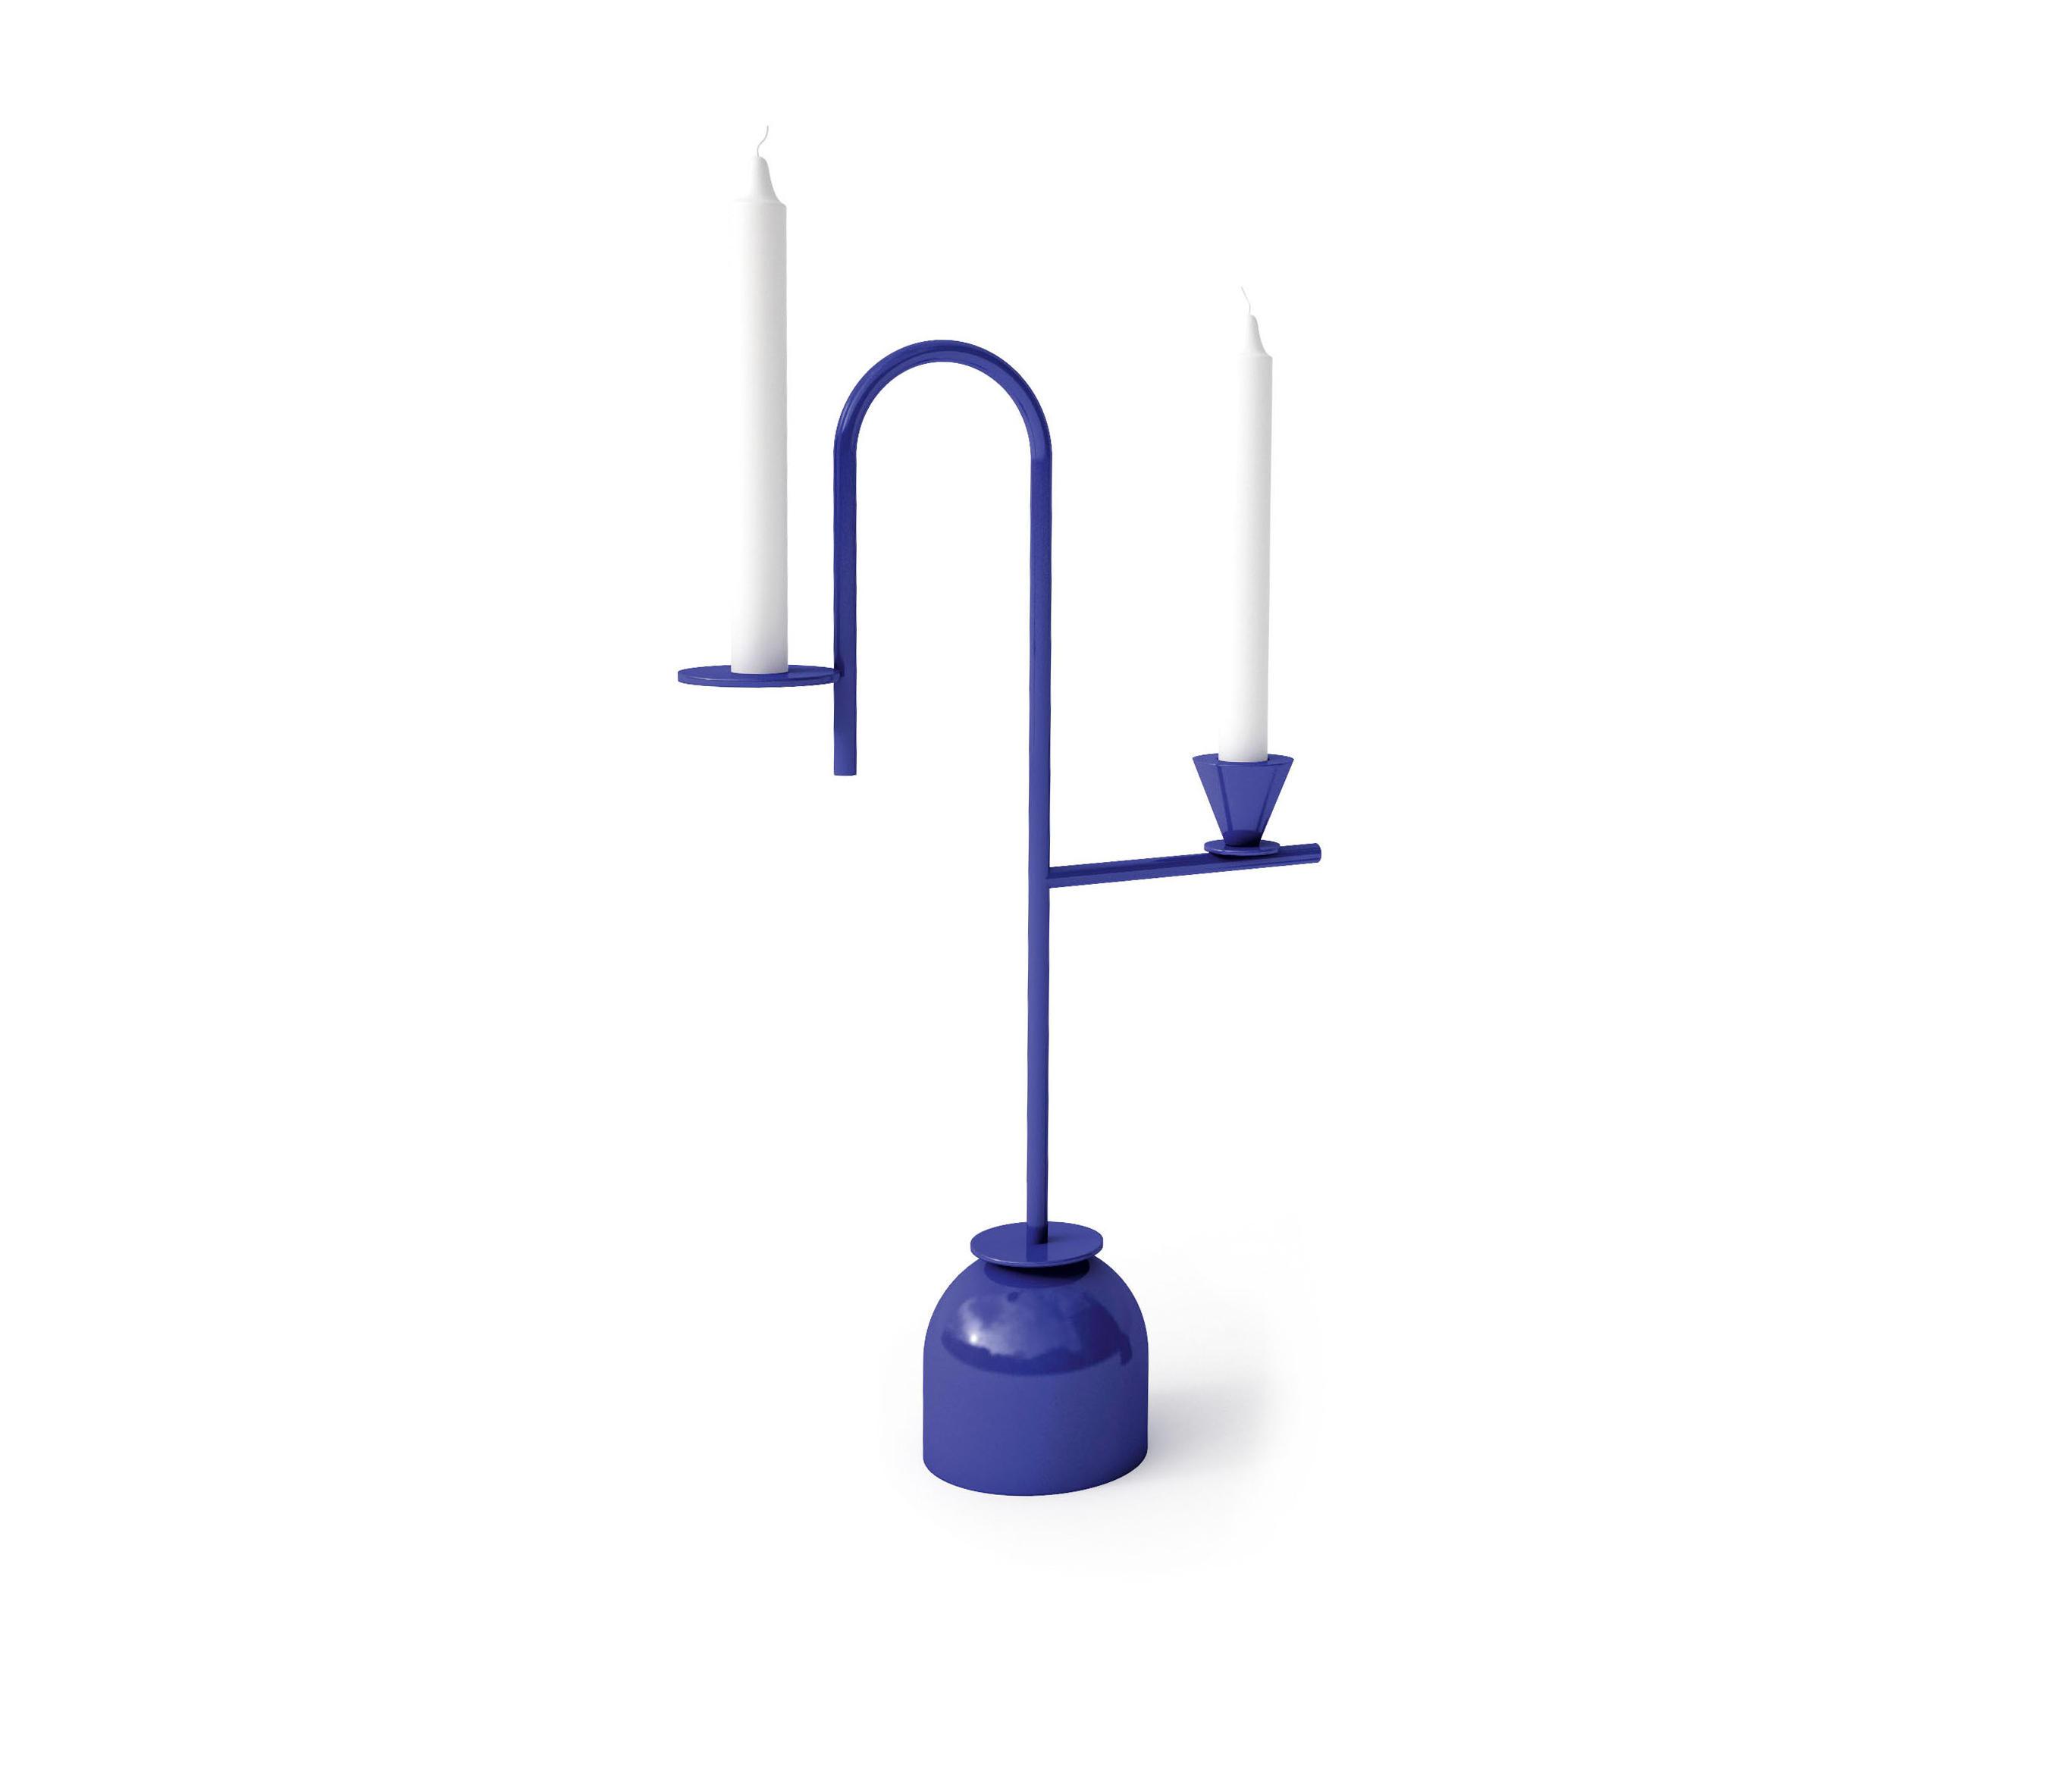 托马斯达里尔 Thomas Dariel| 蓝色烛台 Blue Candleholders